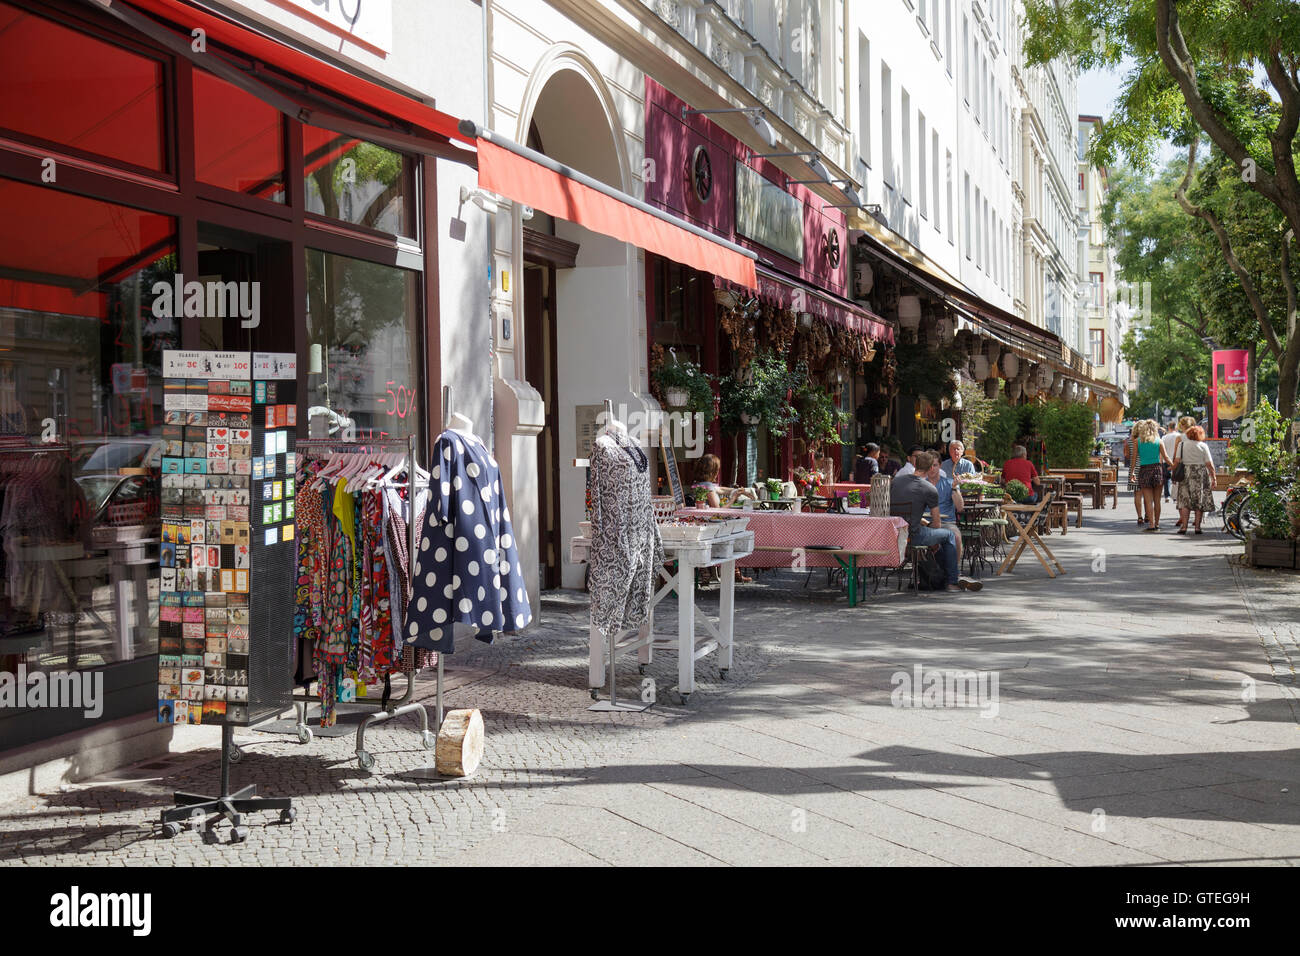 Bergmannstrasse in Kreuzberg people walking and sitting outside Knofi Feinkost Restaurant with clothing store, Berlin, - Stock Image